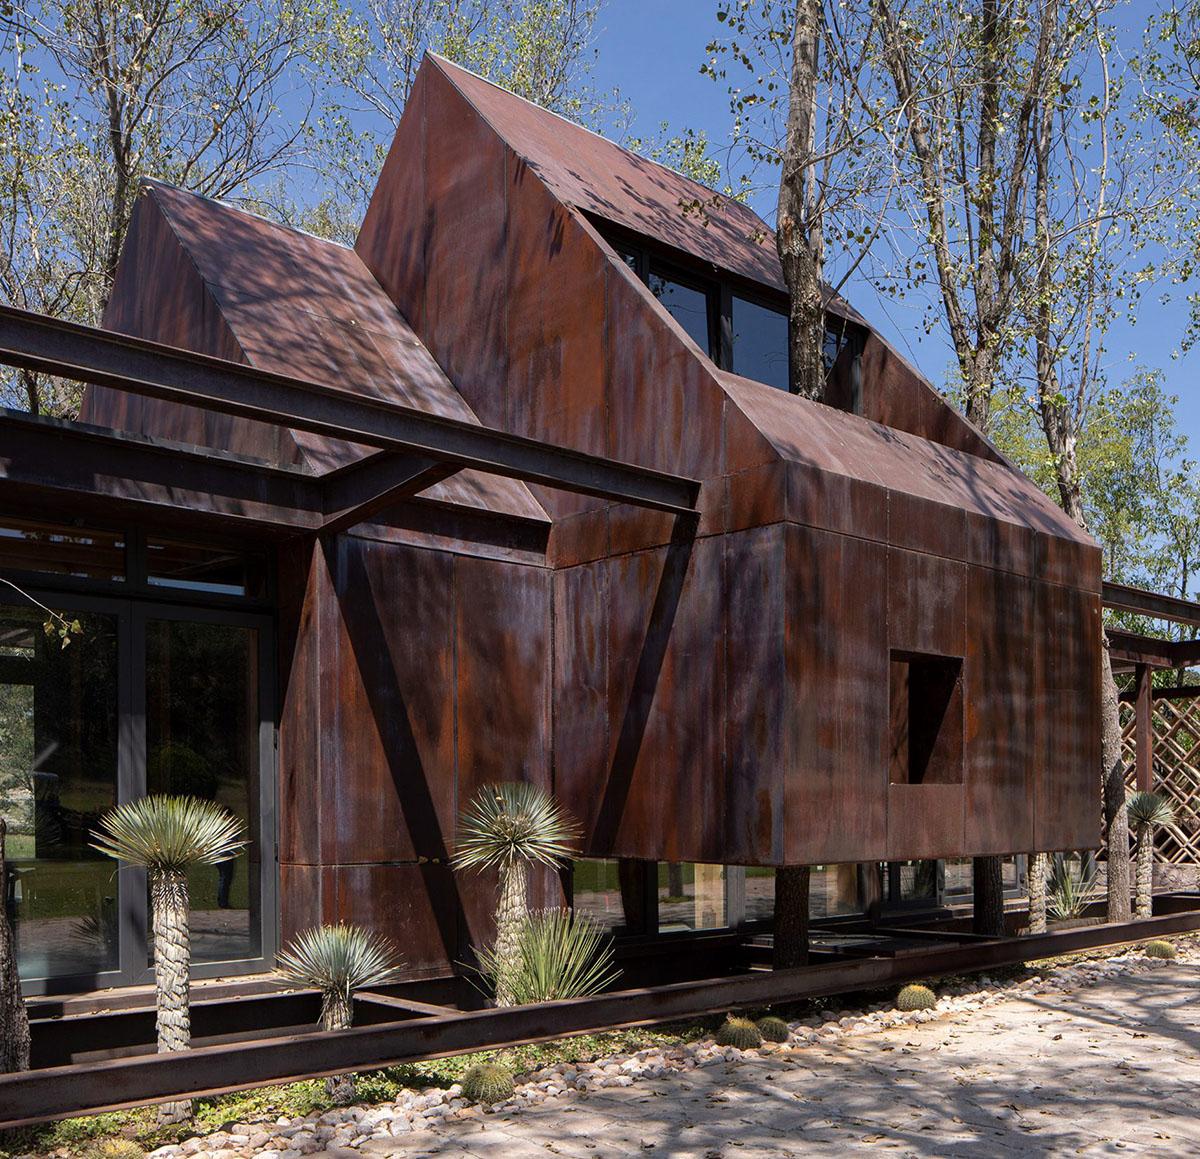 Rancho-Sierra-Allende-Fabian-M-Escalante-H-Arquitectos-Jorge-Succar-04